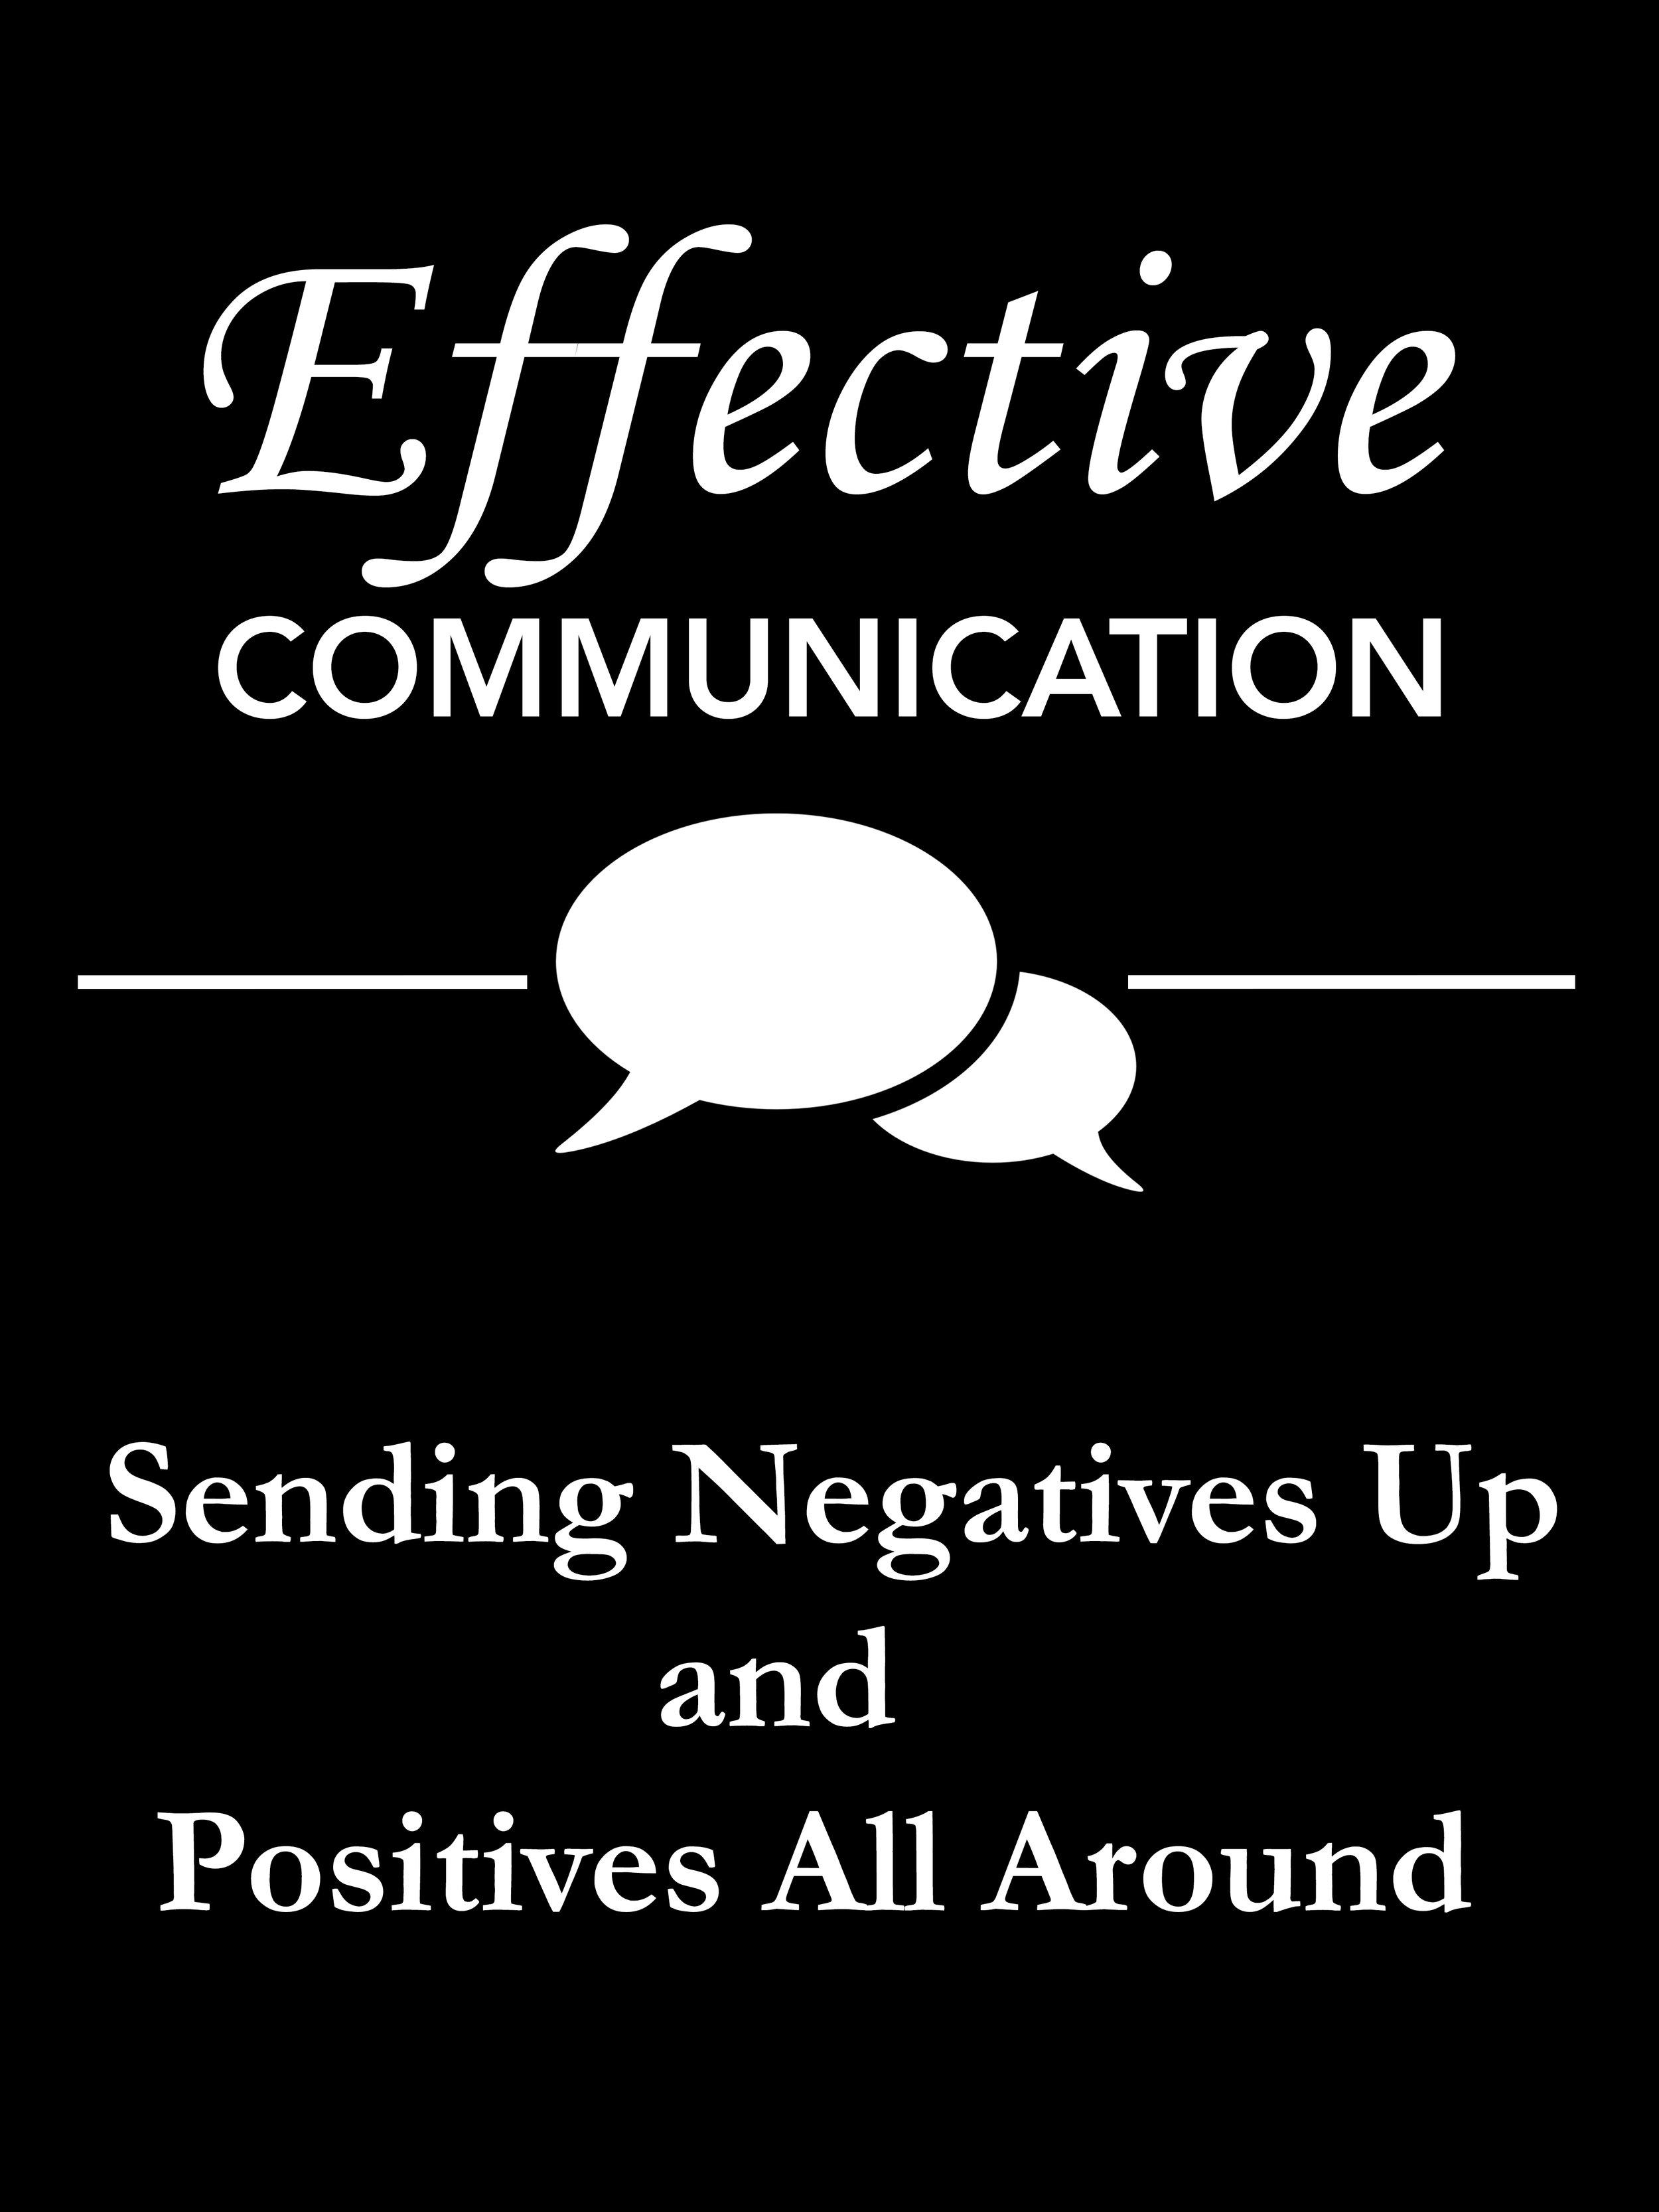 06 Effective Communication.jpg